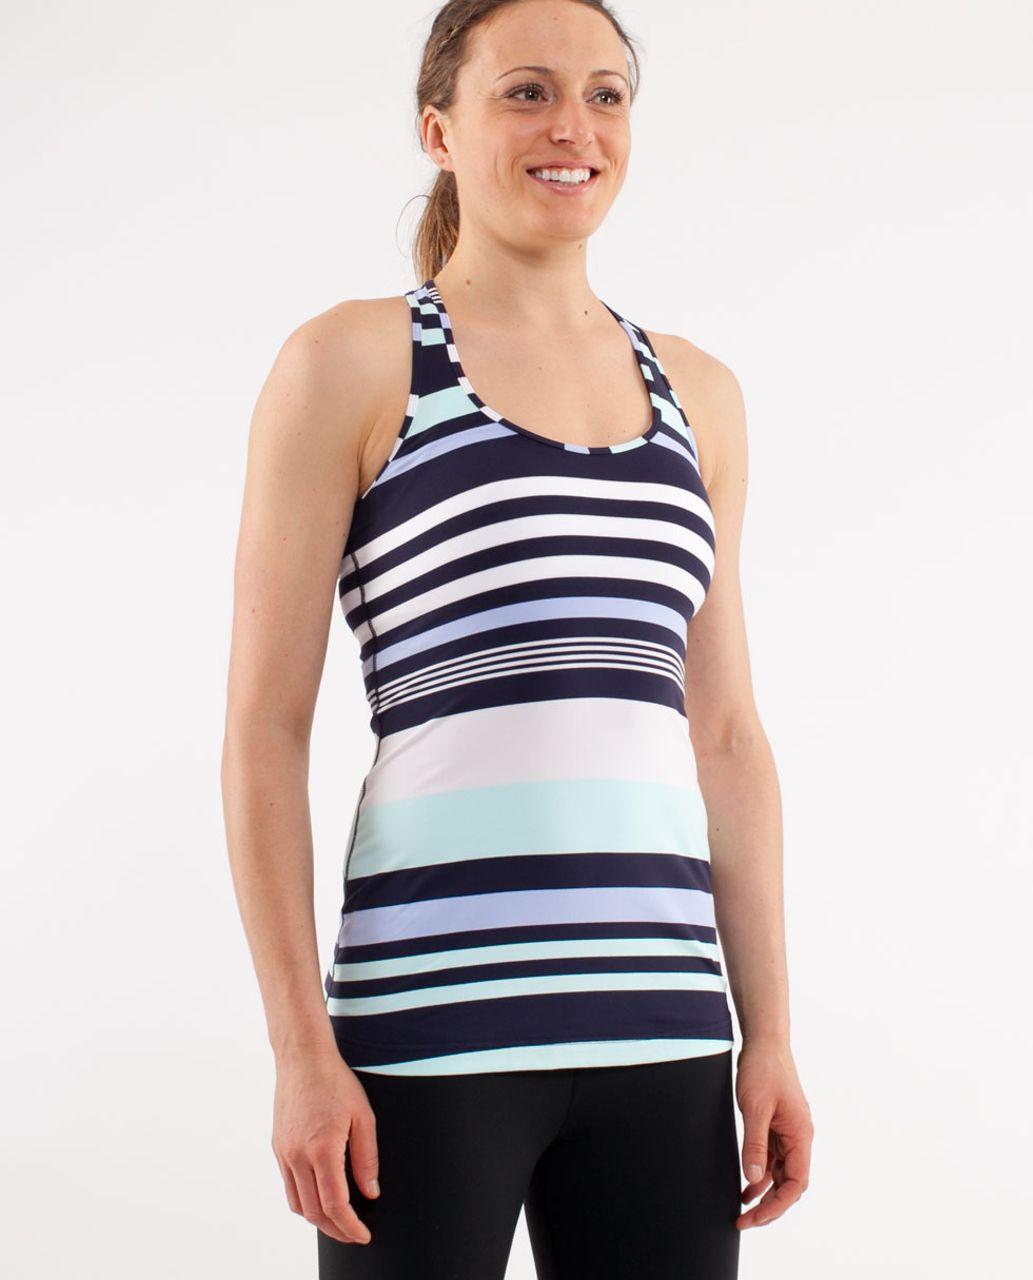 Lululemon Cool Racerback - Discover Stripe White Deep Indigo